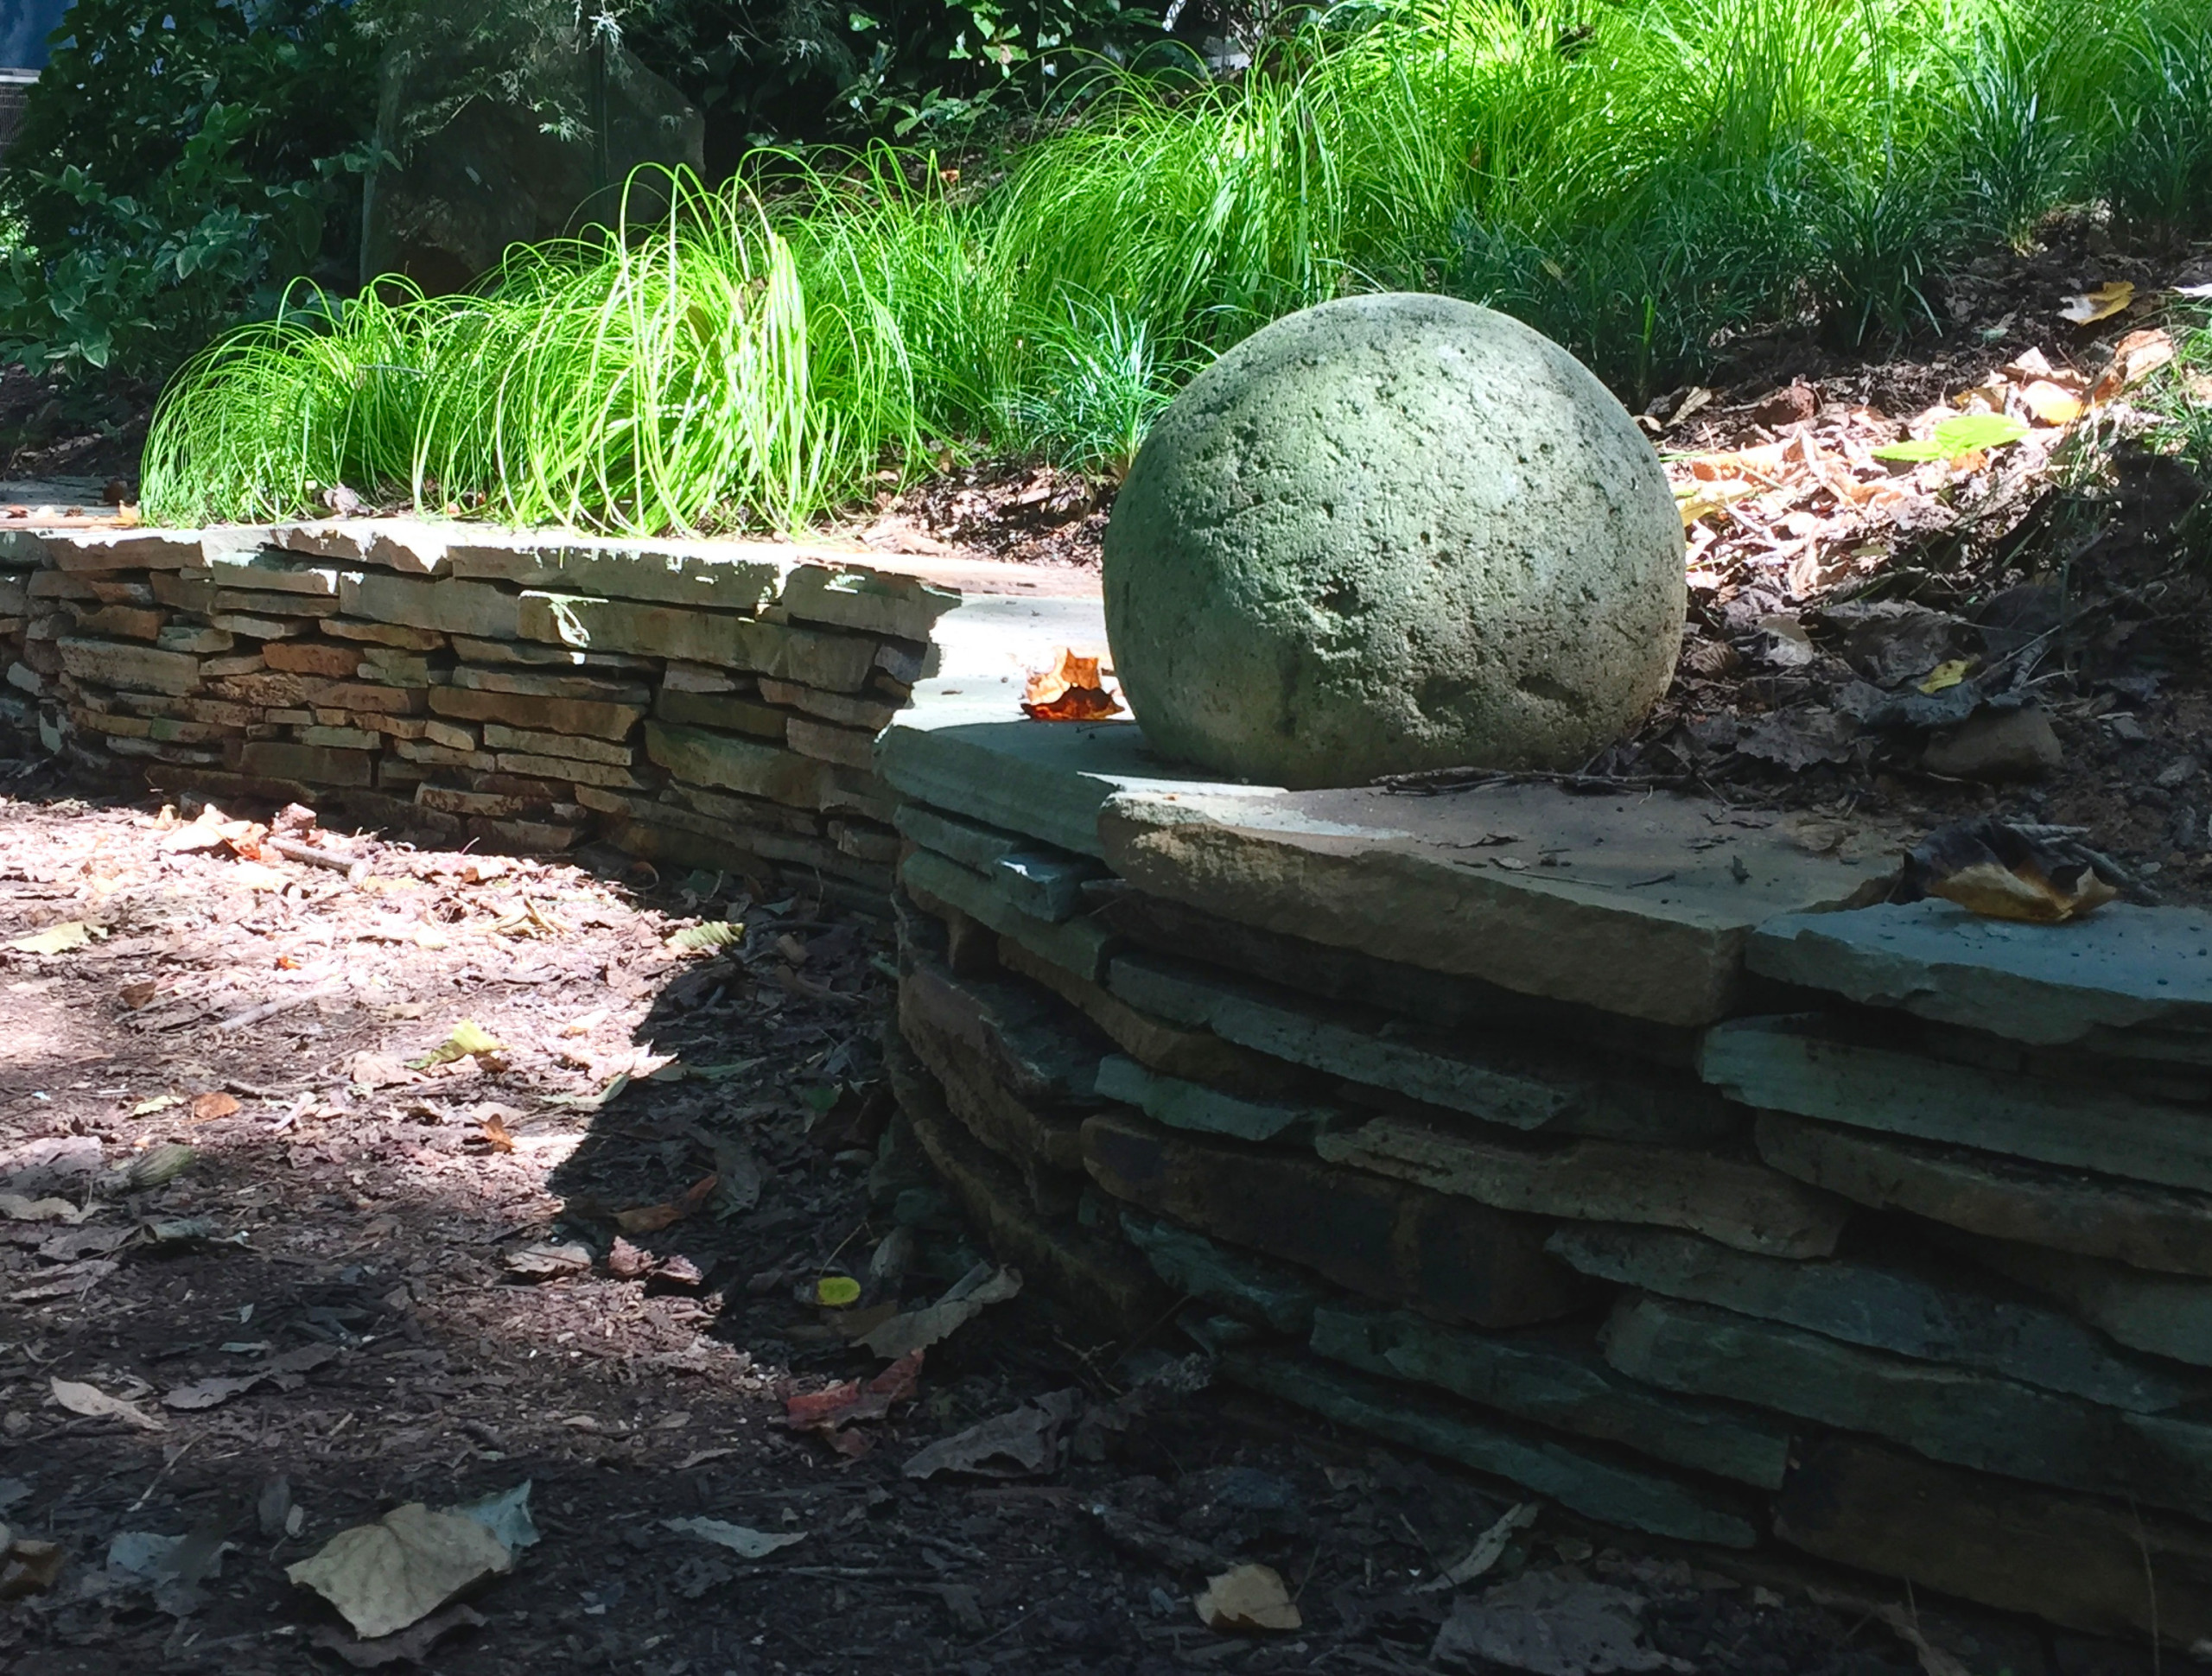 Morning light in the sculpture garden